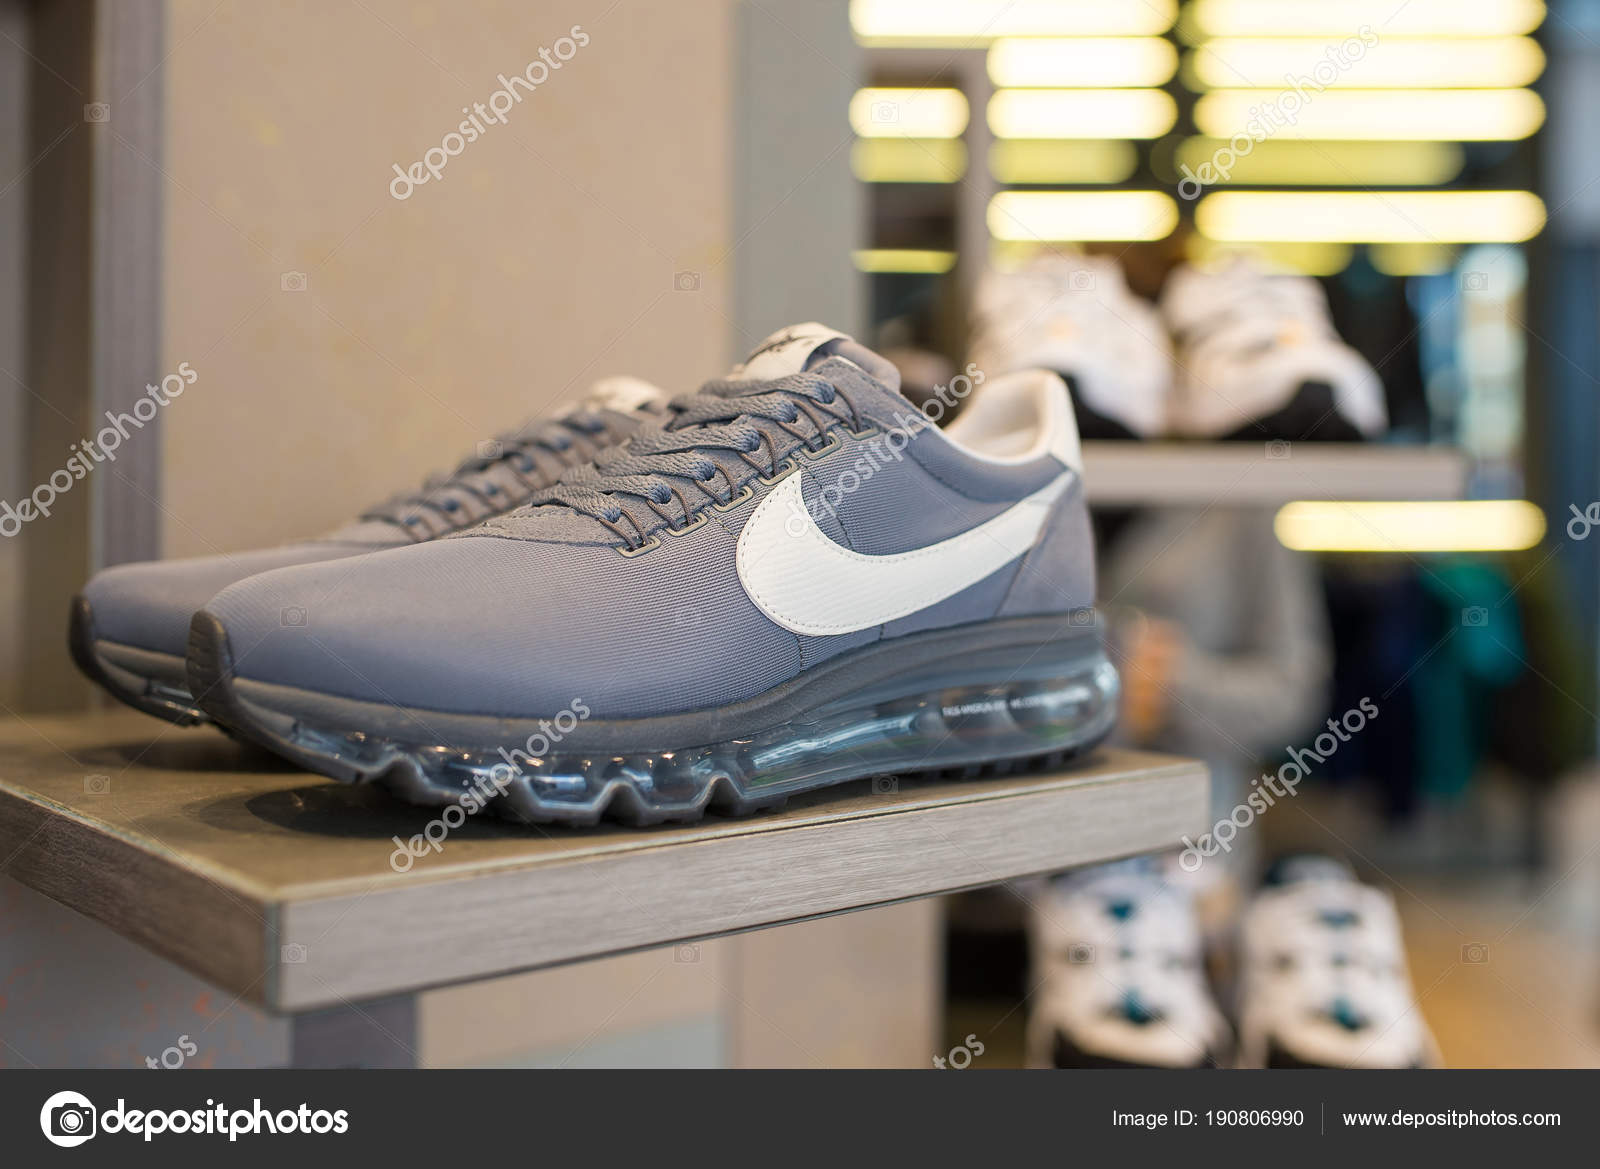 Milan Italy September 2016 Exposition Nike Sport Shoes Nike One ... 4a5efa51e